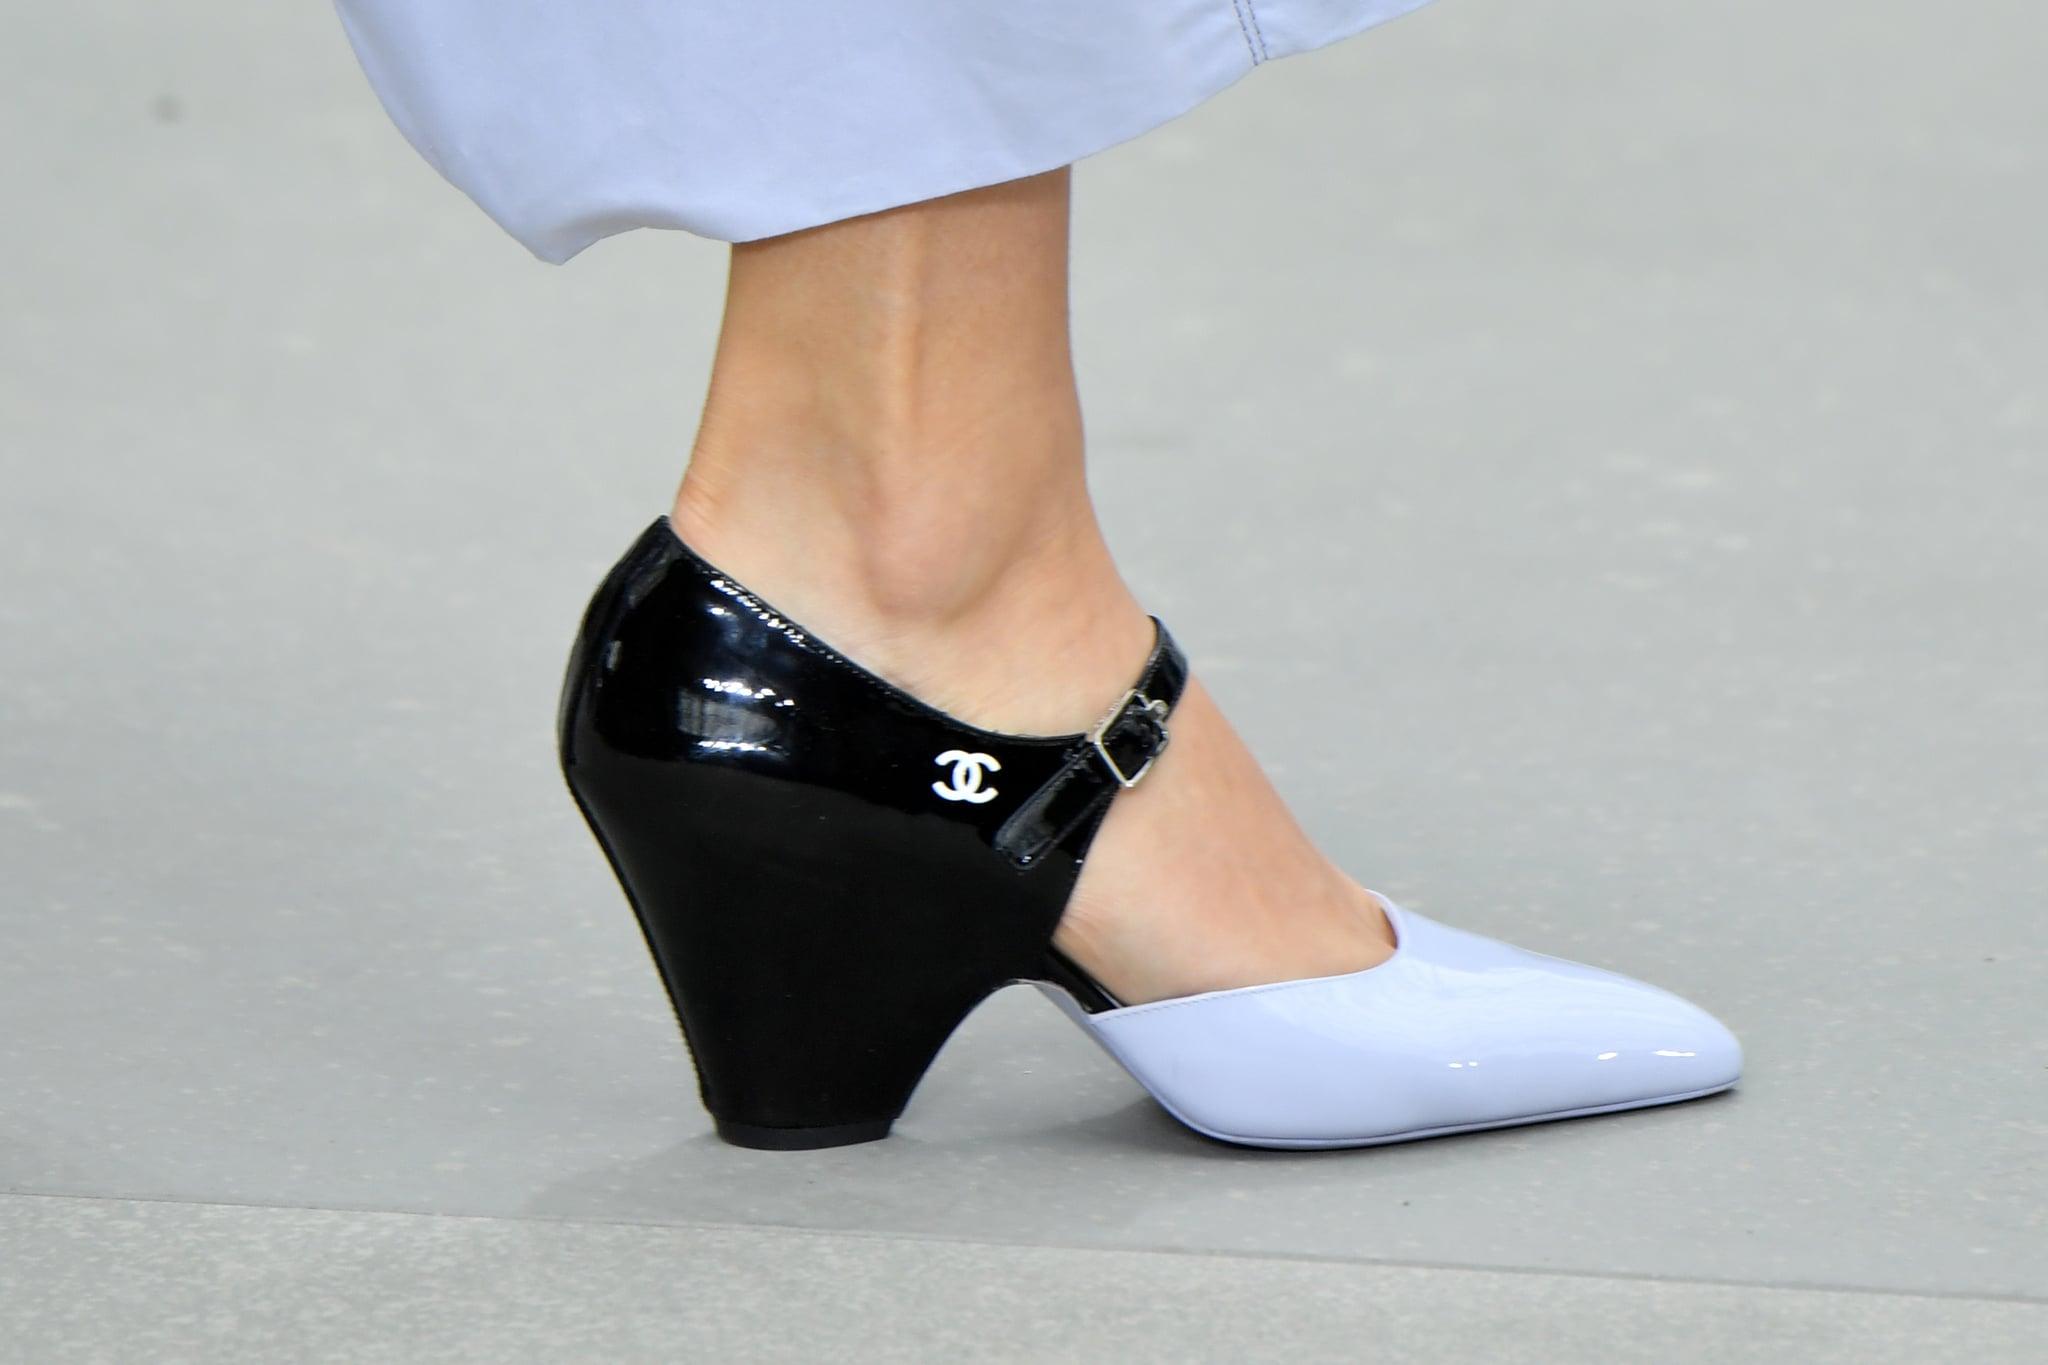 Midheel Shoes Had a Space-Age Heel